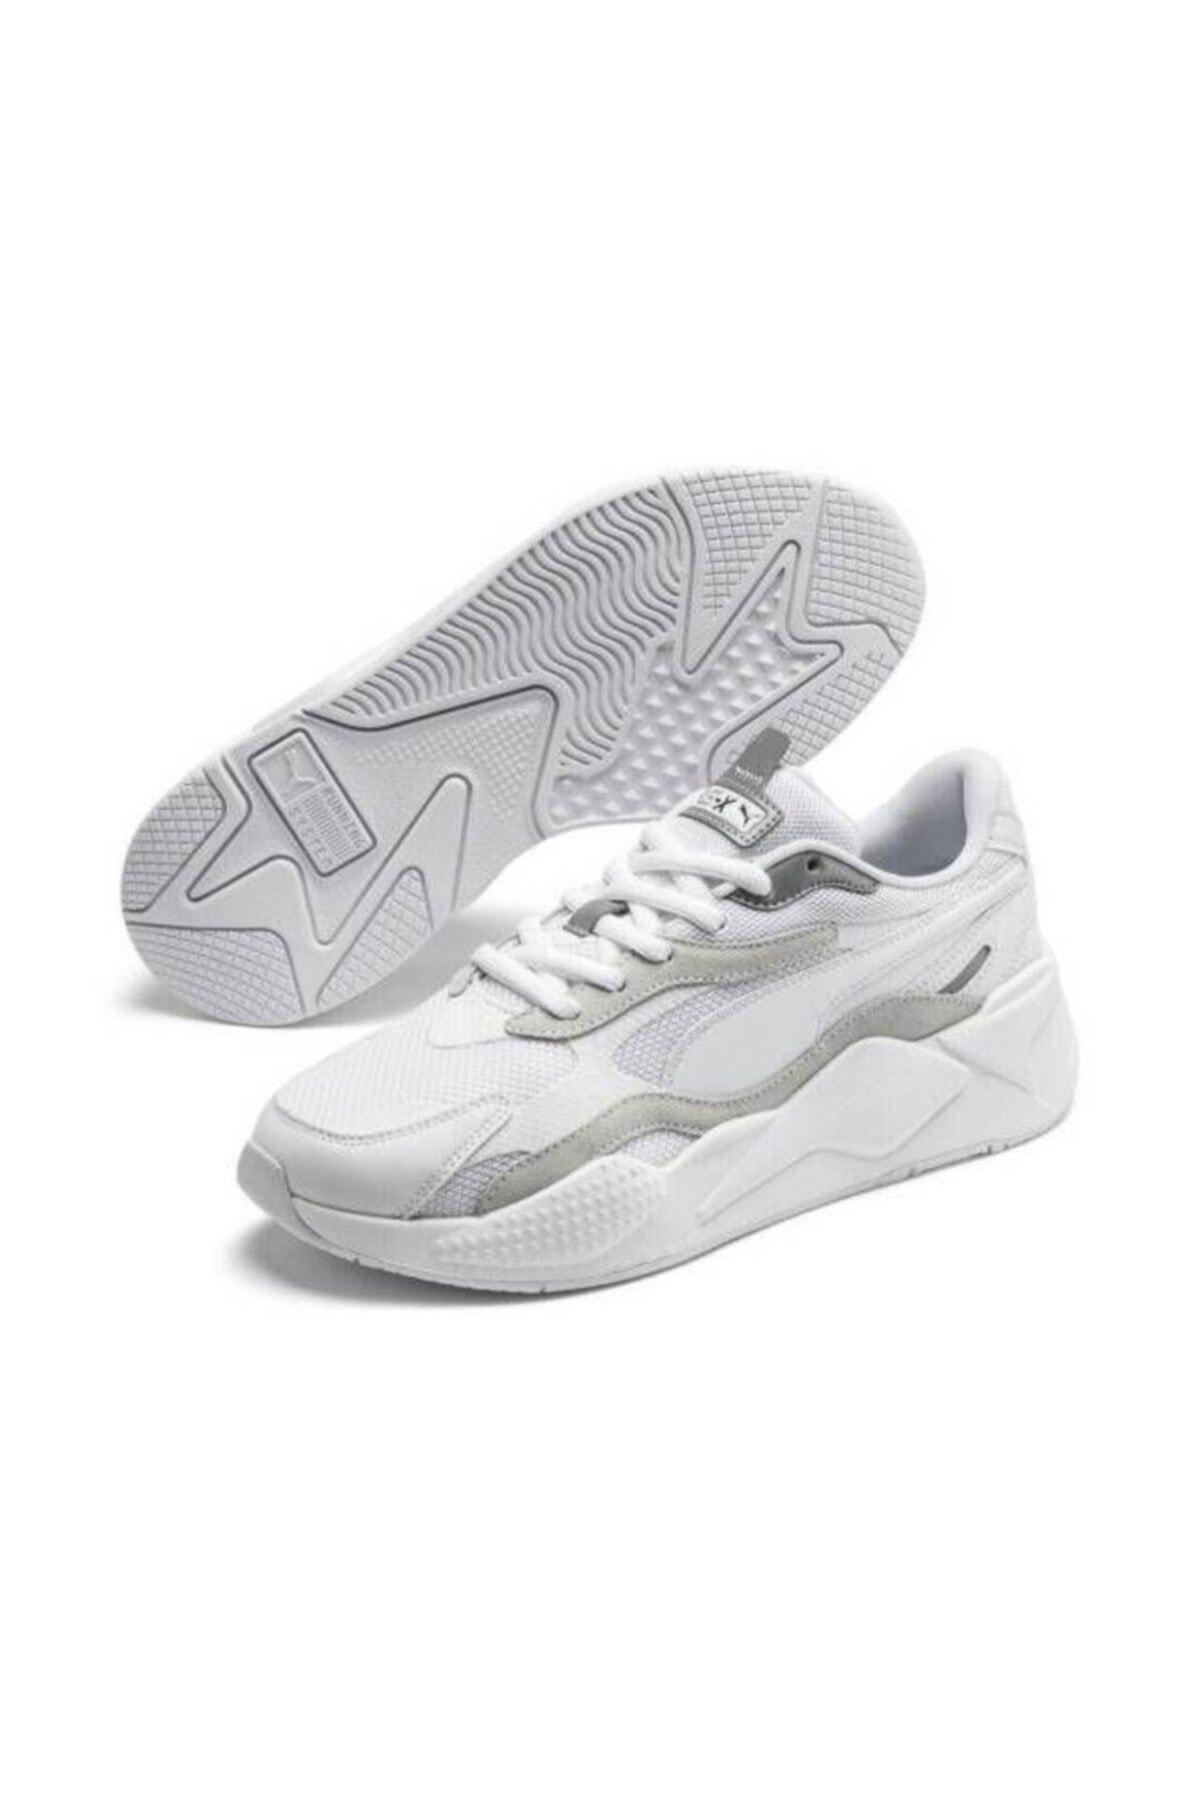 Puma Rs-x³ Puzzle Erkek Spor Ayakkabı - 37157003 1